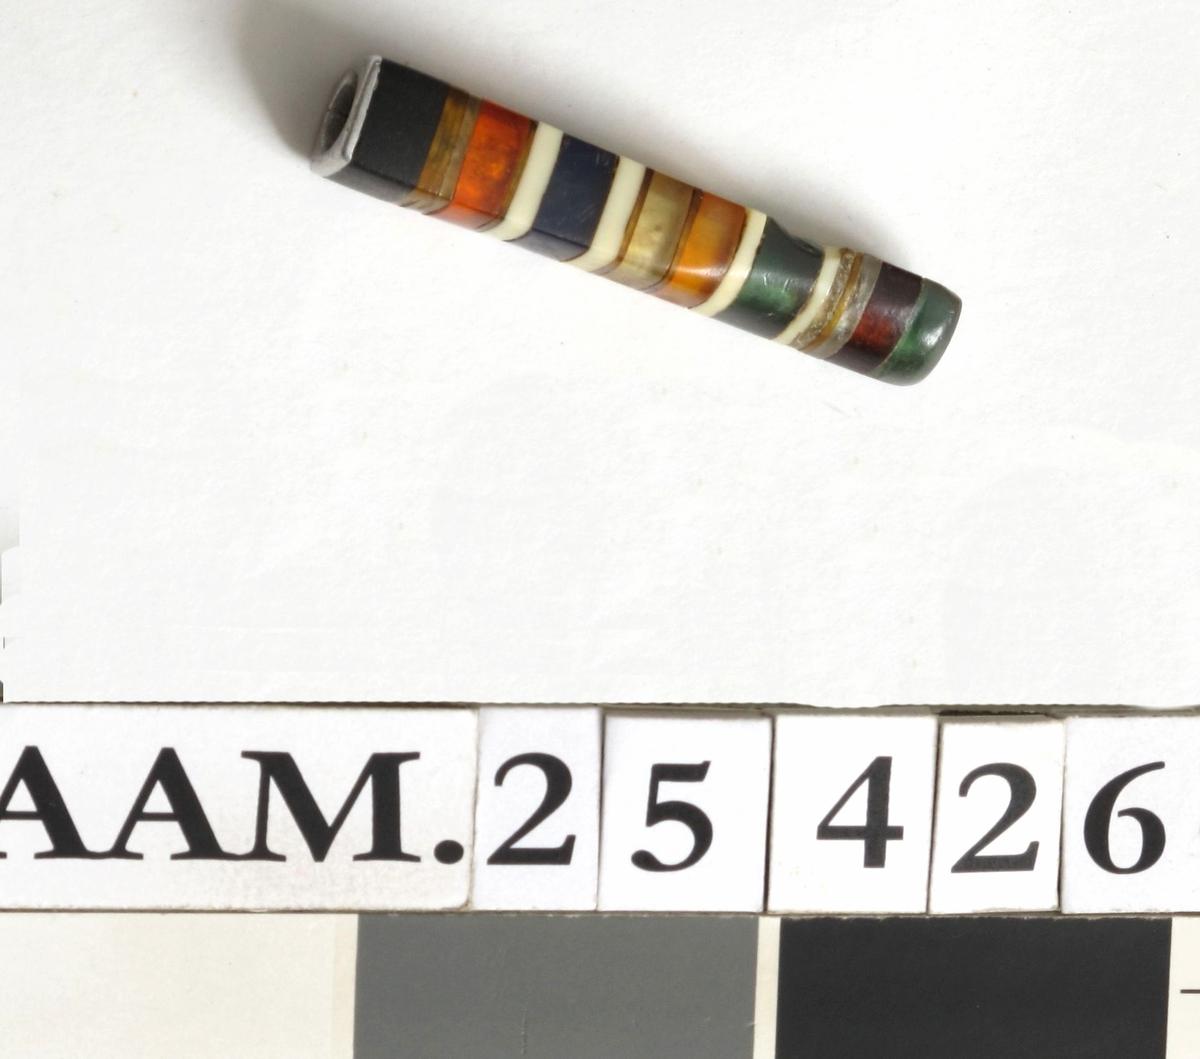 Striper i ulike farger.